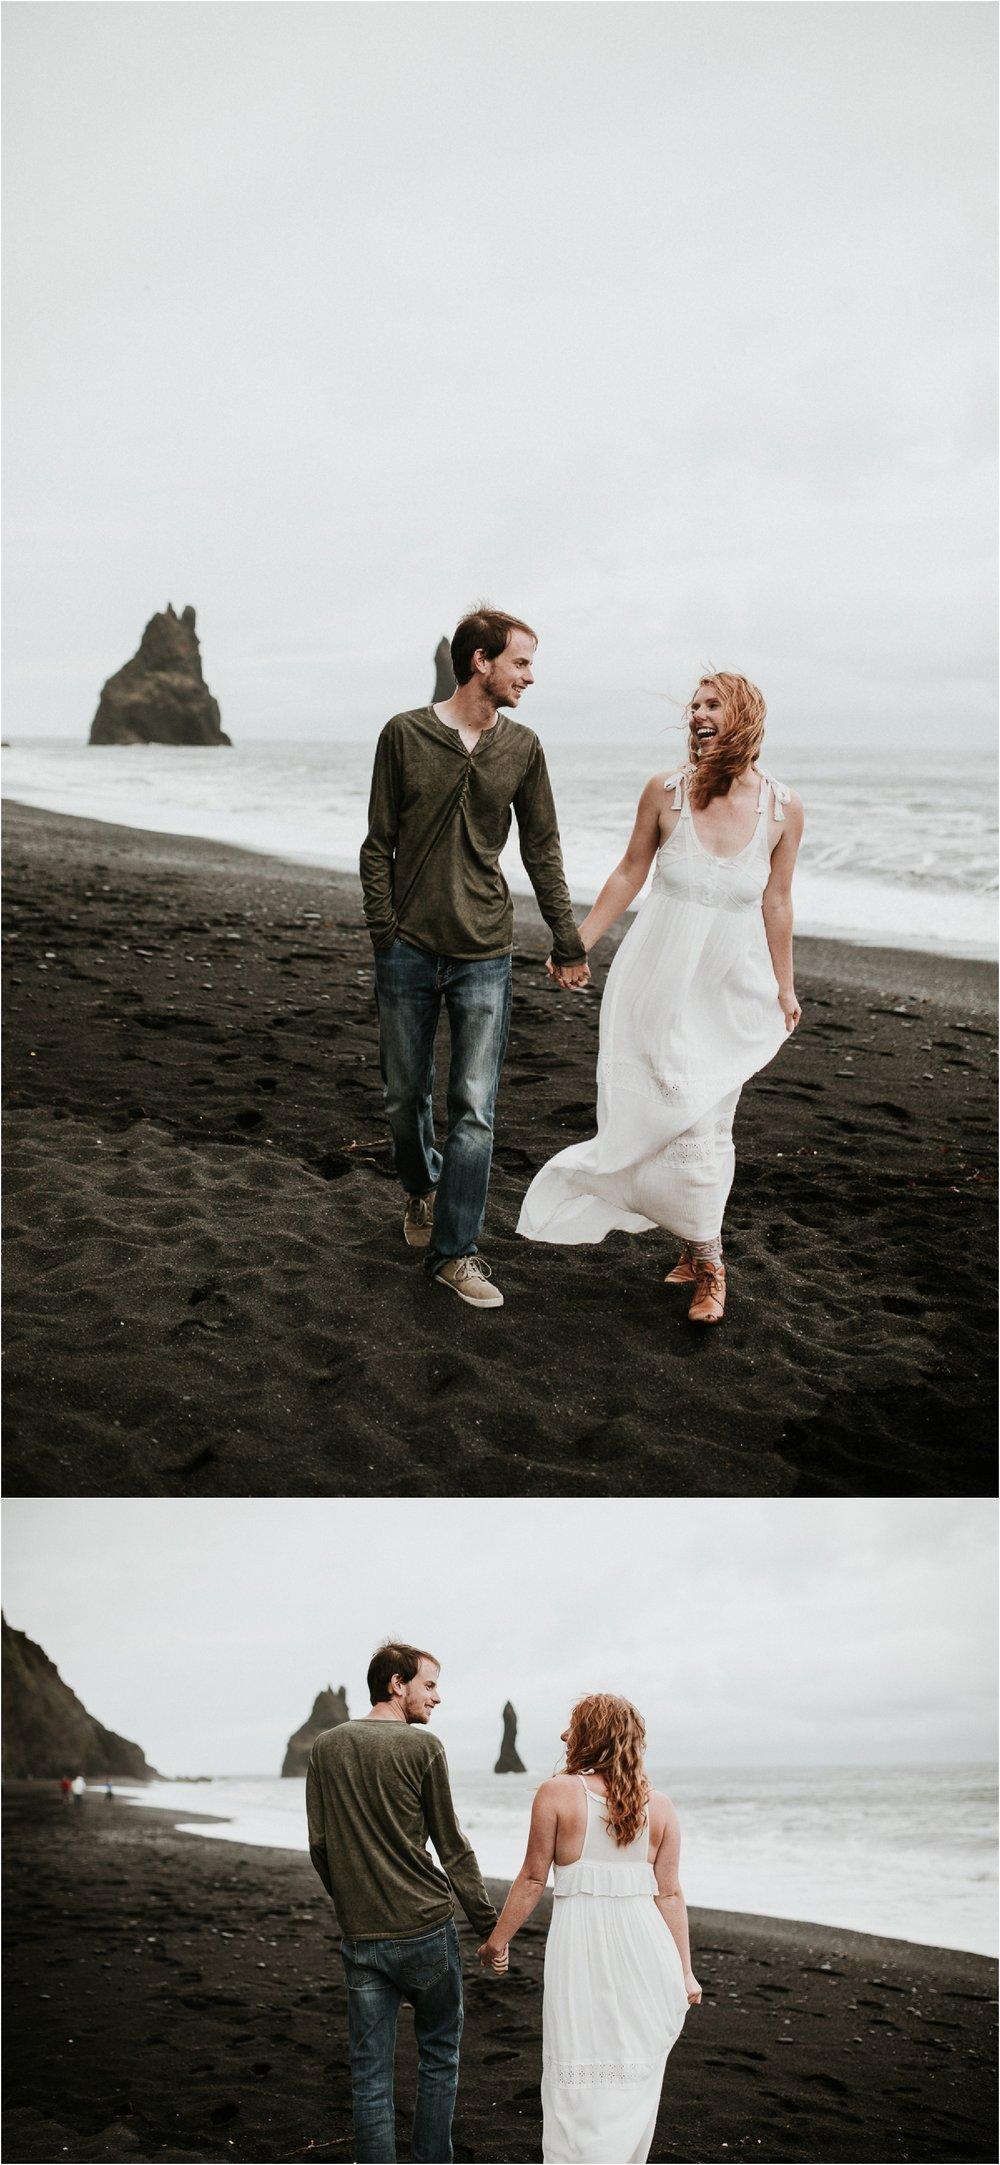 Iceland-wedding-photographer-62.jpg